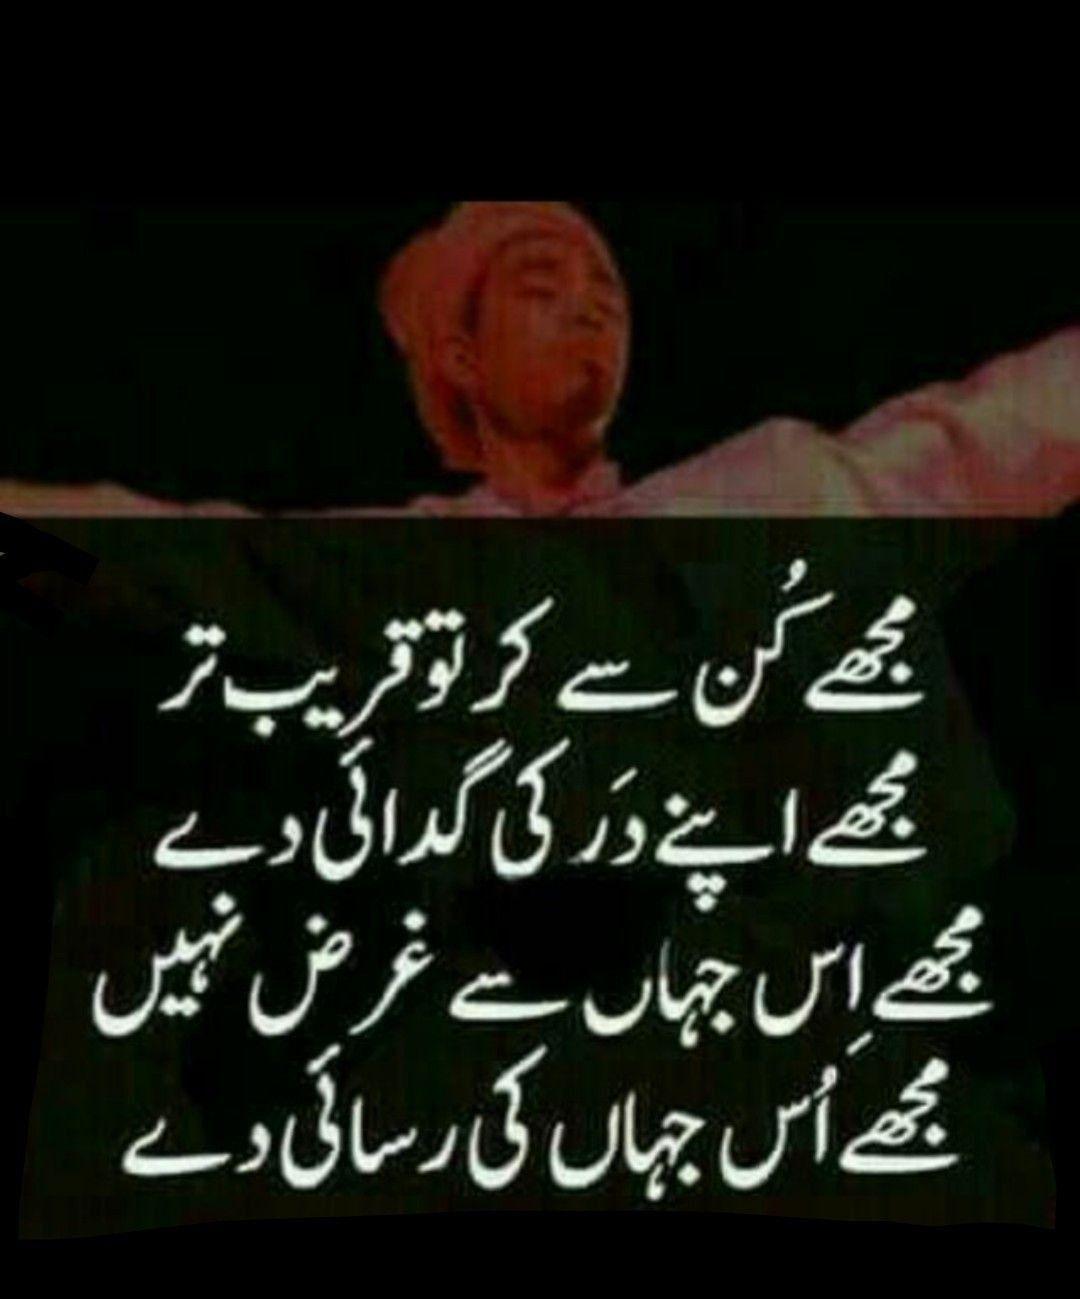 Islamic Quotes In Urdu Jumma Mubarak Jumma Mubarak Jumma